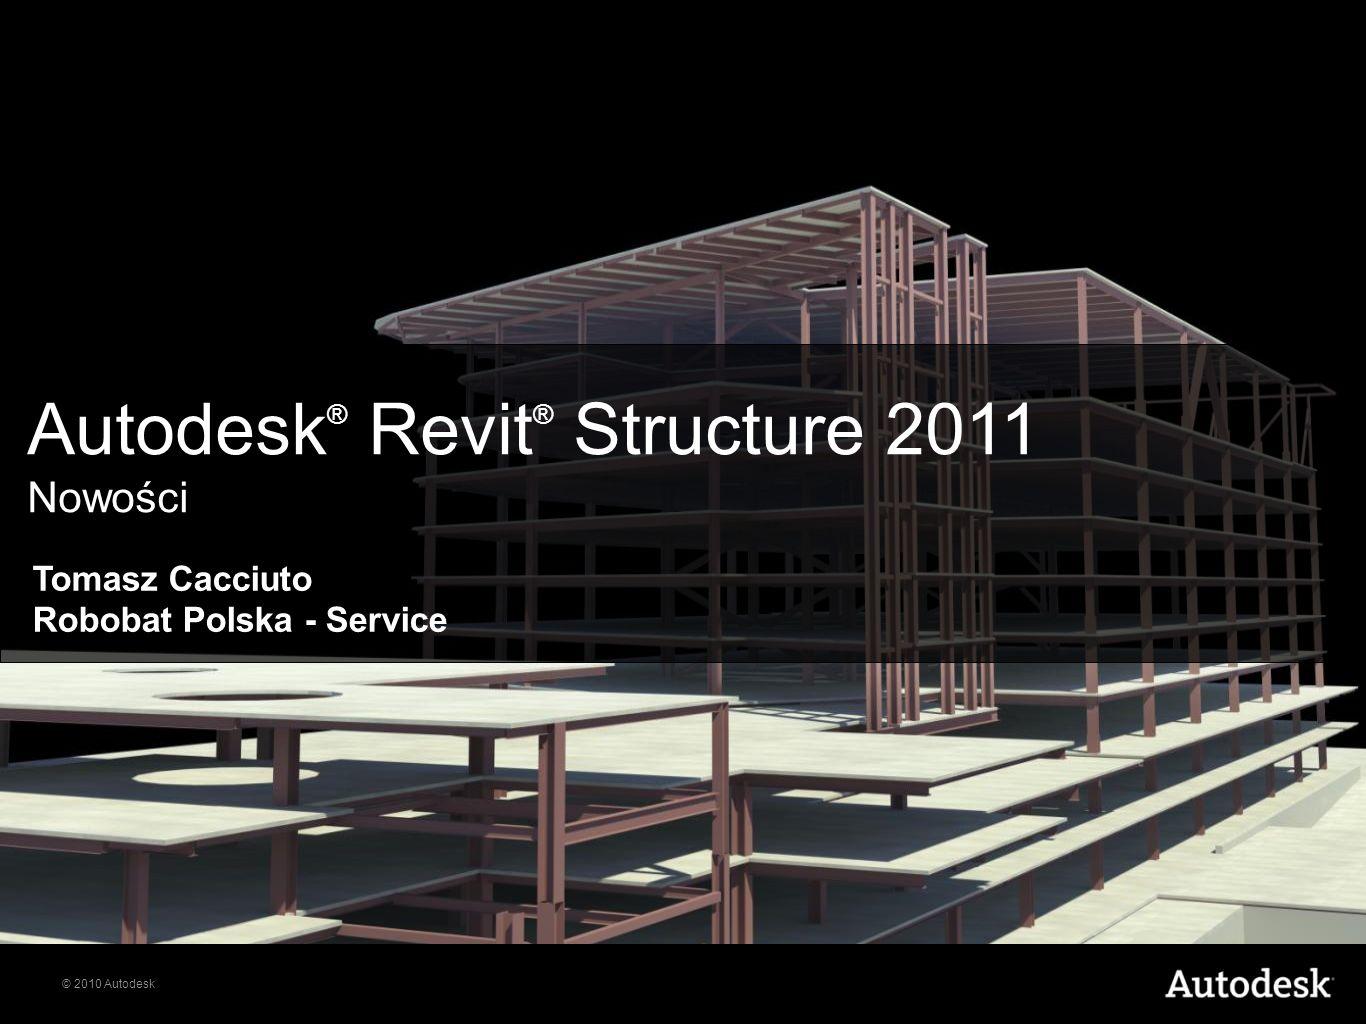 © 2010 Autodesk Autodesk ® Revit ® Structure 2011 Nowości Tomasz Cacciuto Robobat Polska - Service